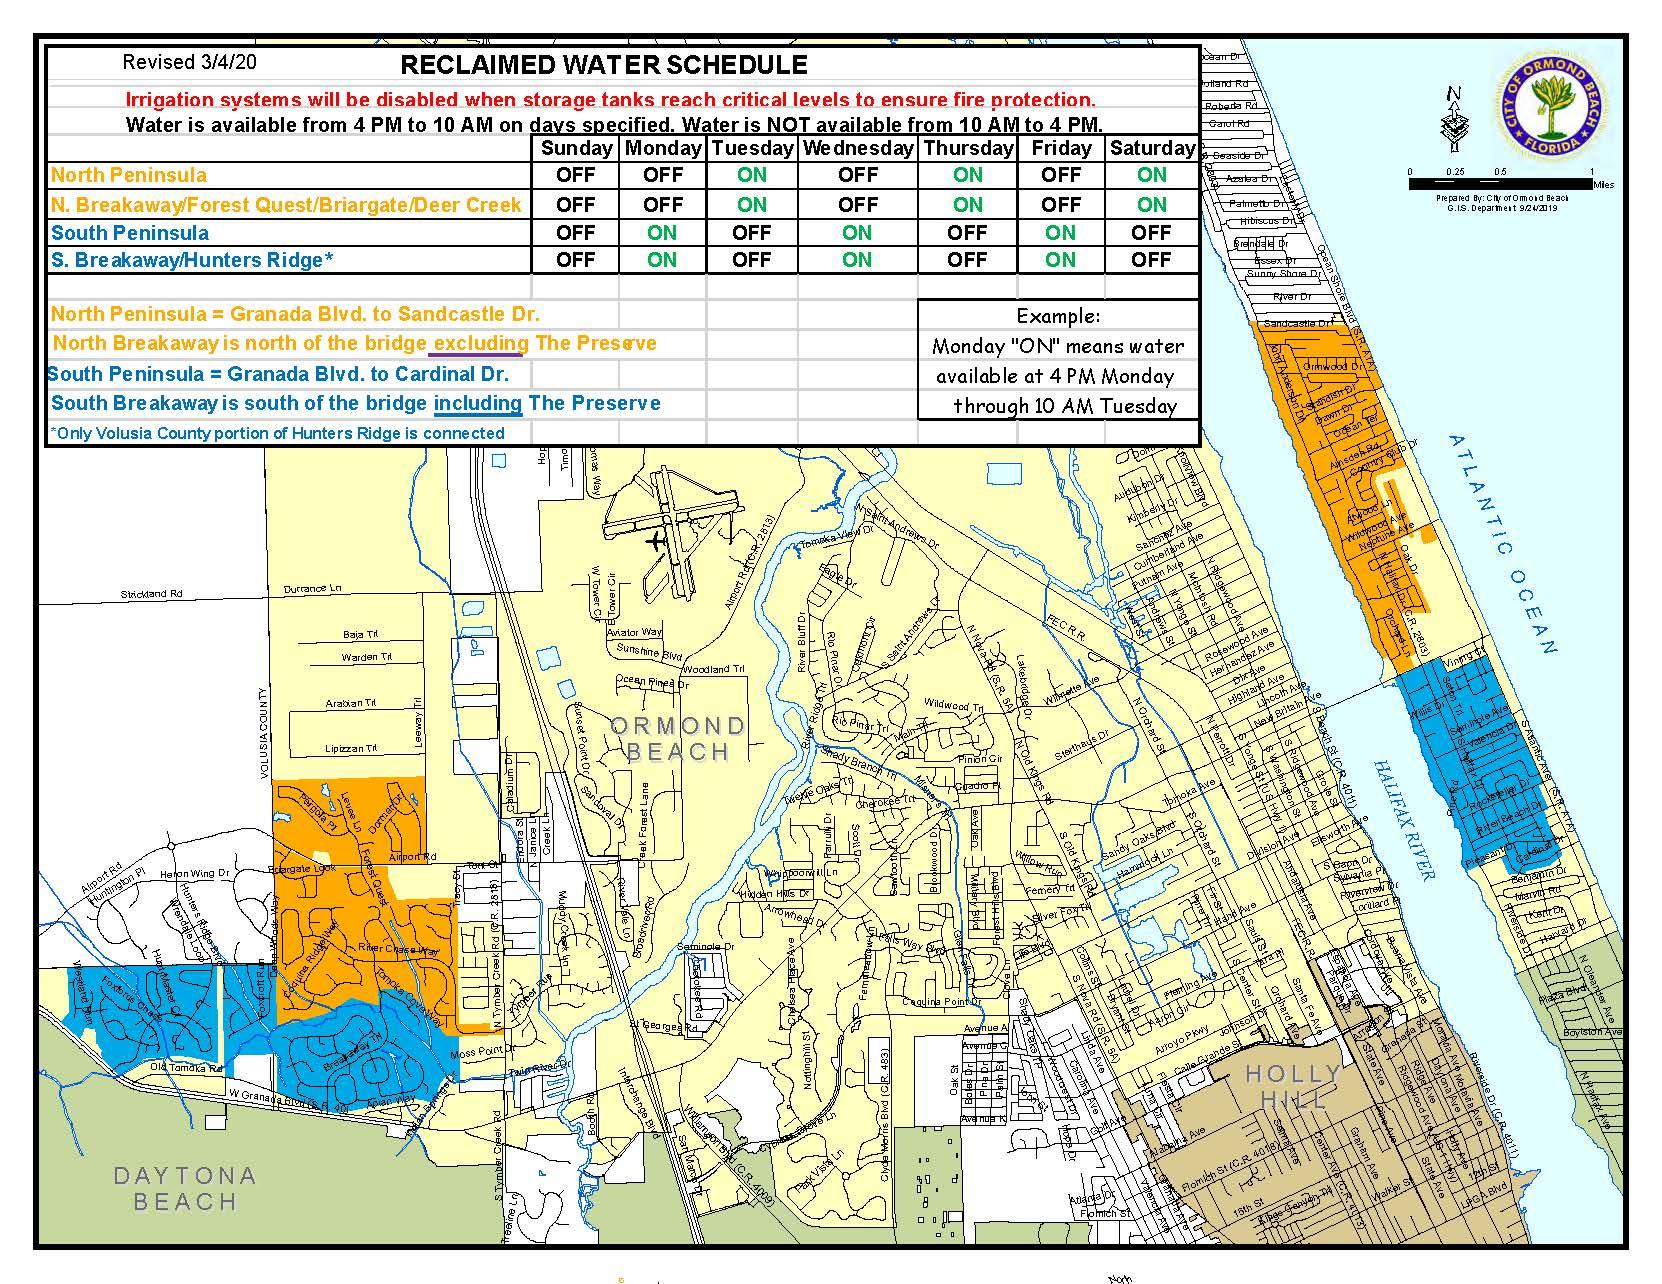 reclaimed water schedule map